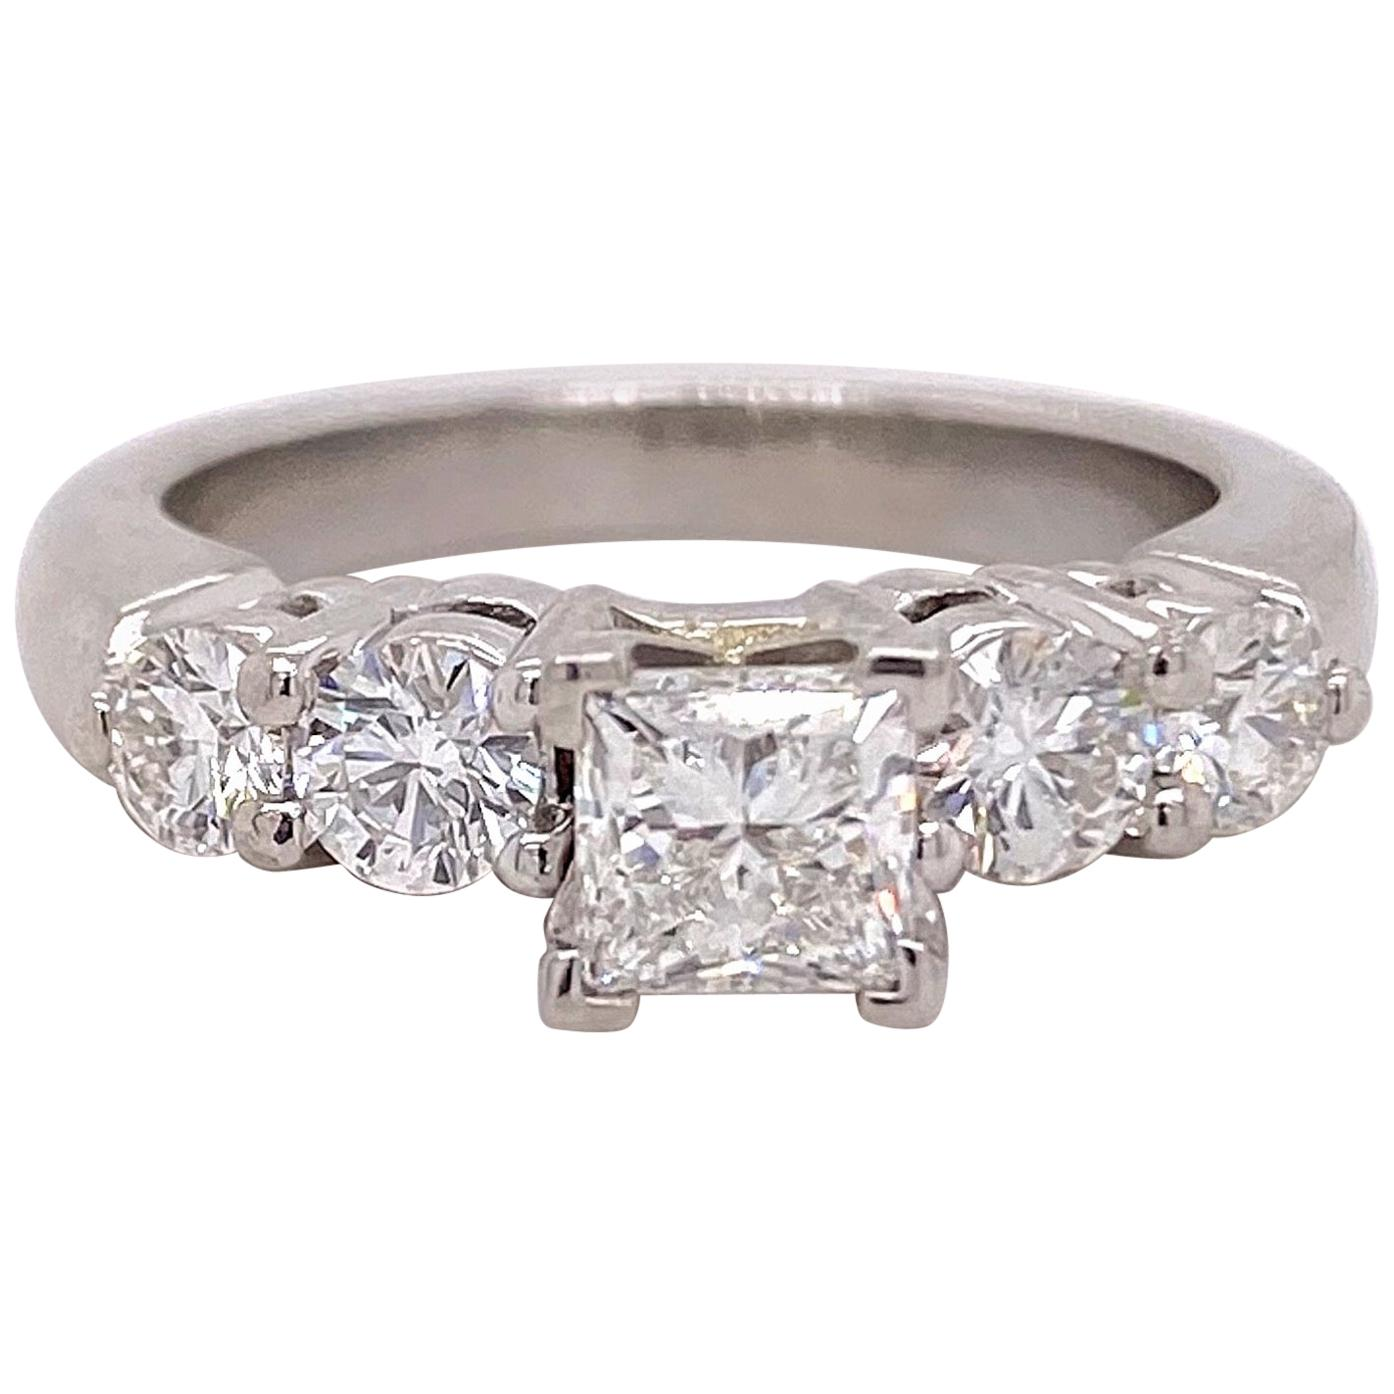 Blue Nile Princess Diamond 1.36 Carat G VS1 Platinum Engagement Ring AGS